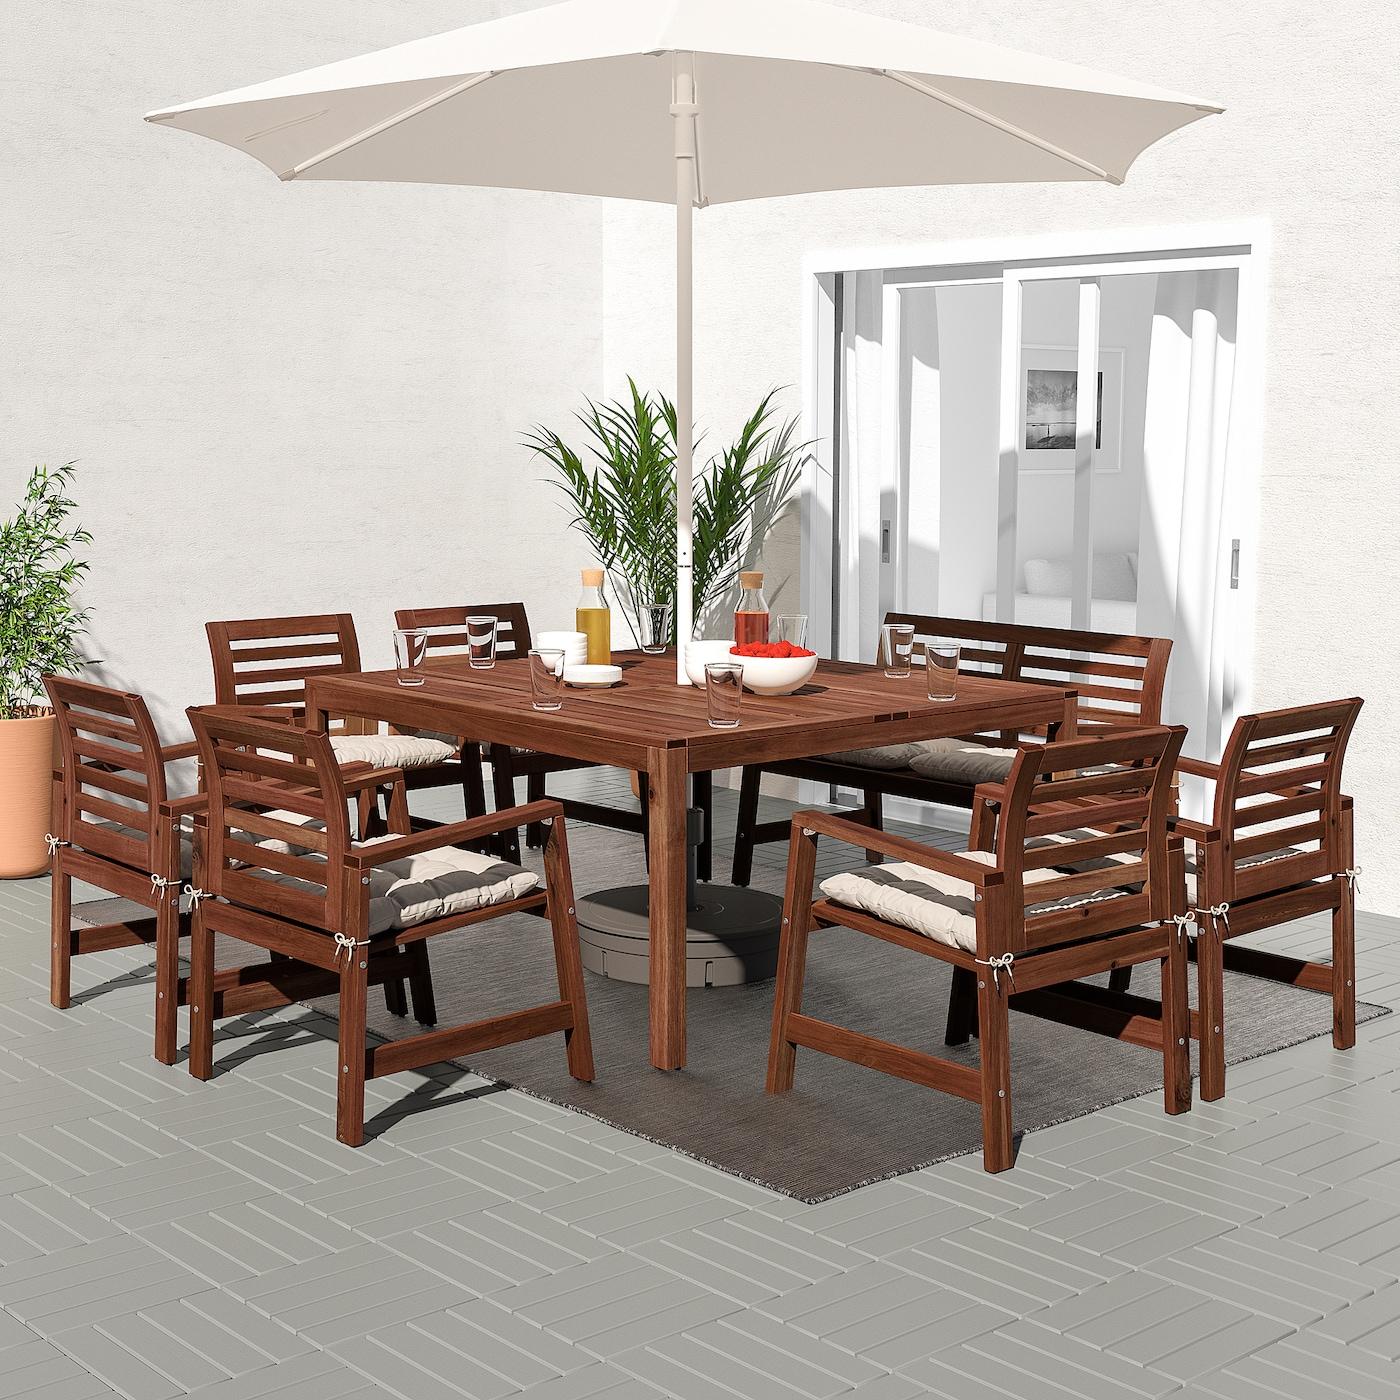 ÄPPLARÖ Bord, utomhus, brunlaserad, 140x140 cm